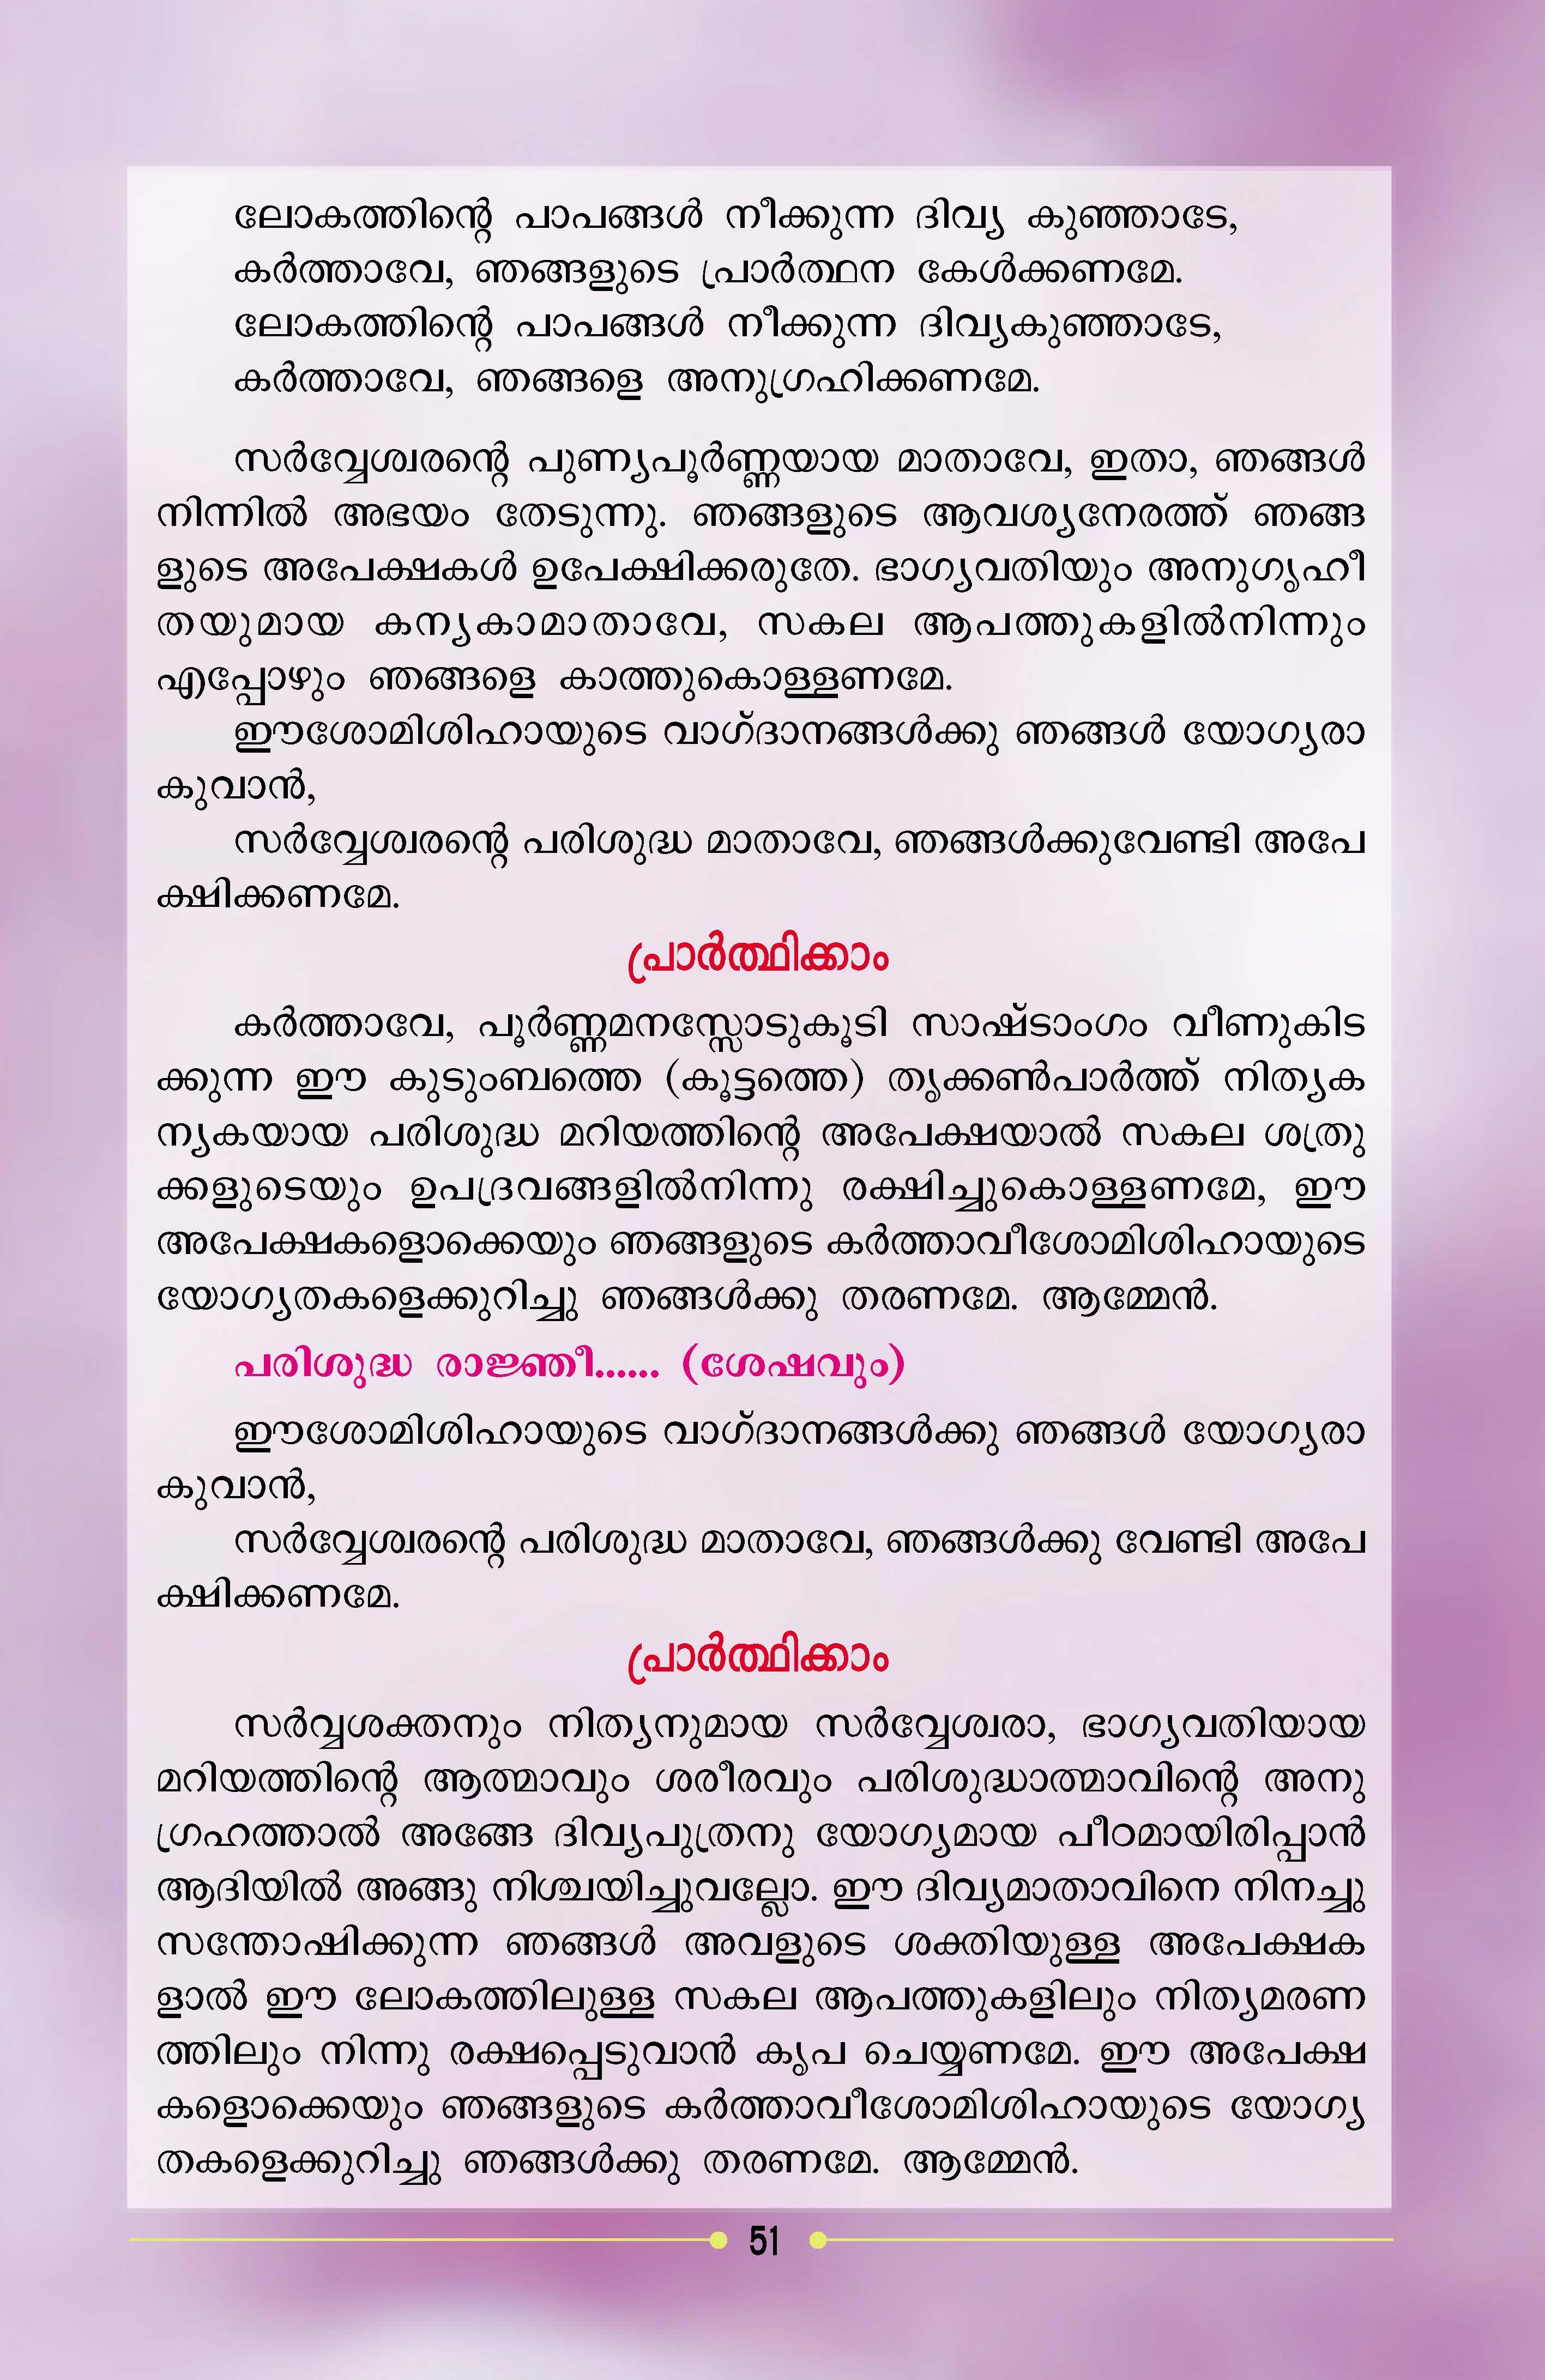 Holy Rosary Malayalam 09